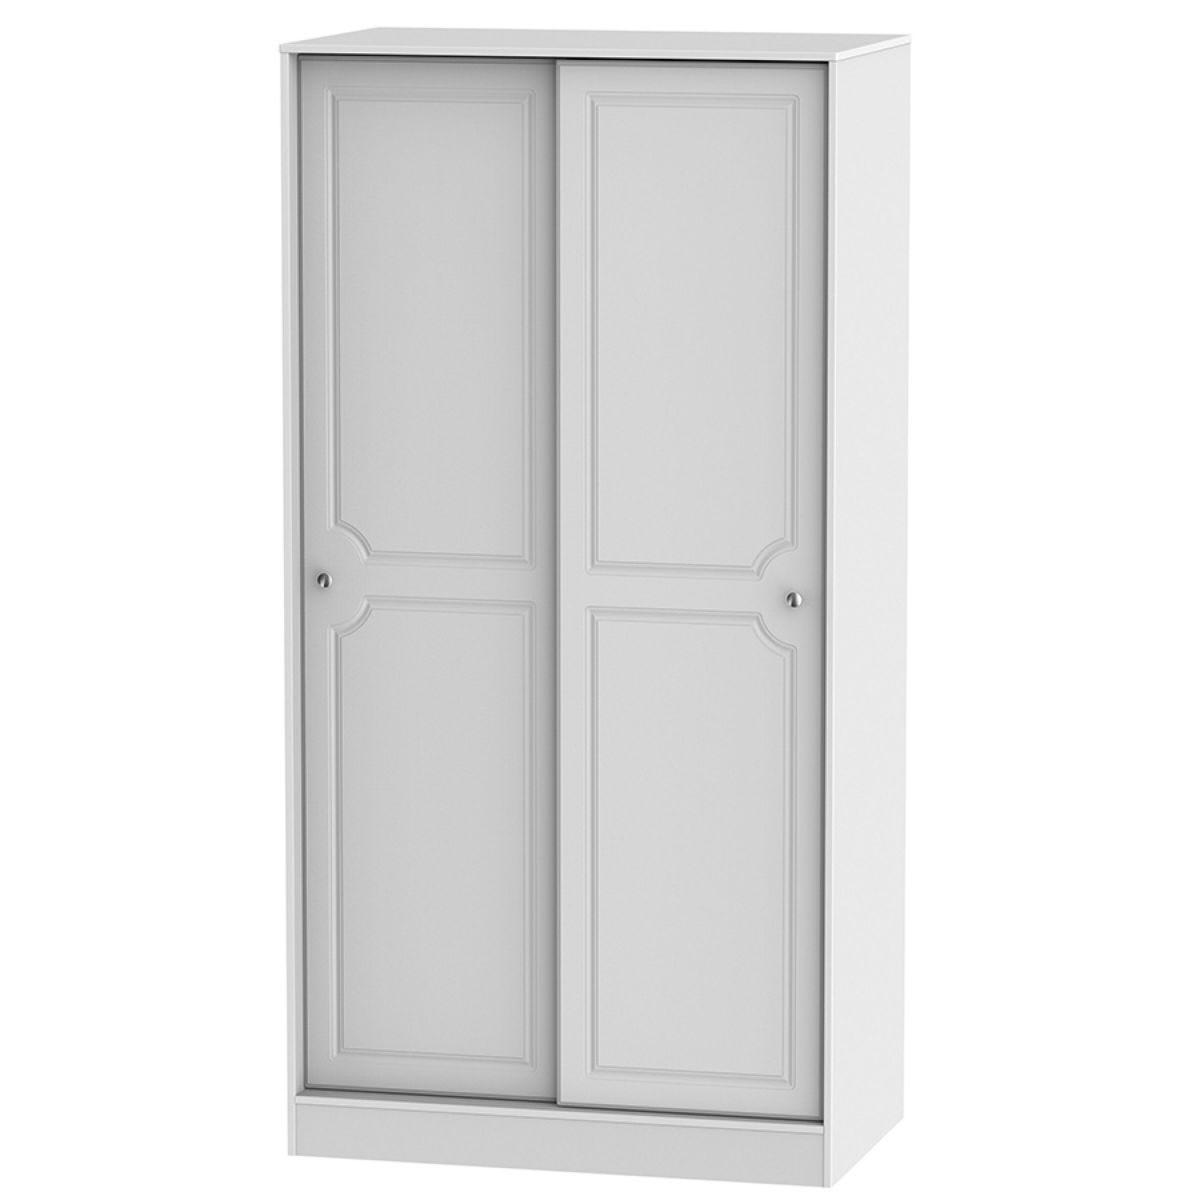 Montego 2-Door Sliding Wardrobe - White